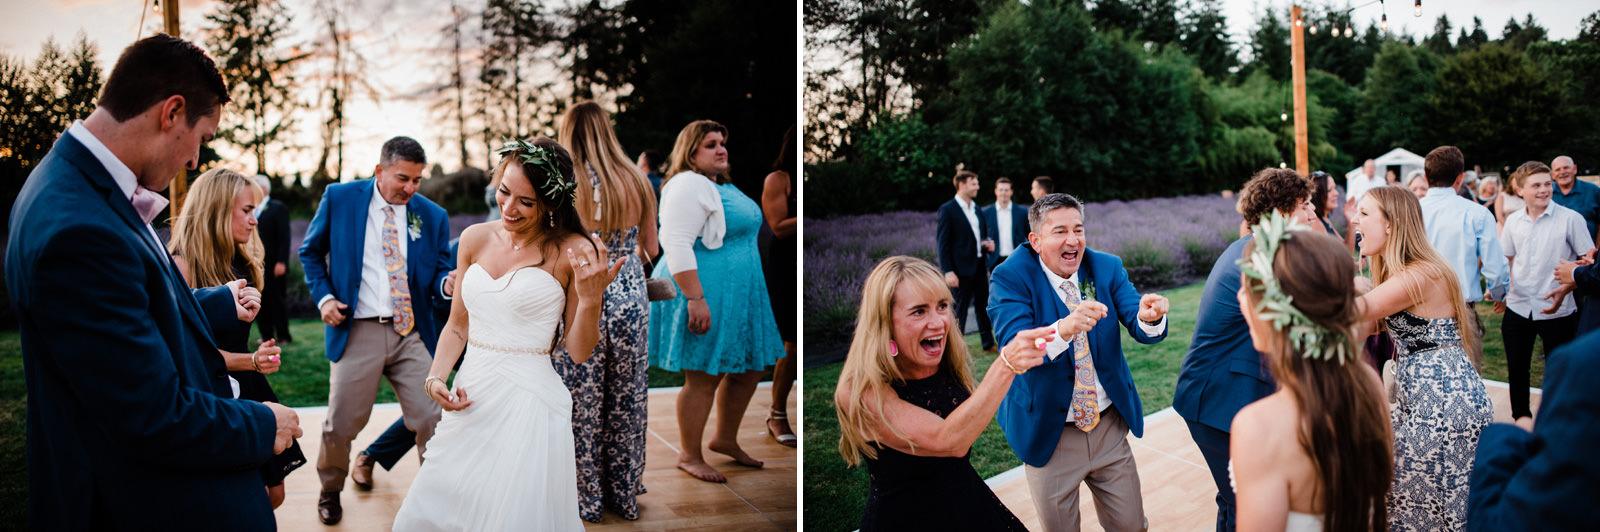 108-woodinville-lavendar-farm-wedding-with-golden-glowy-photos.jpg